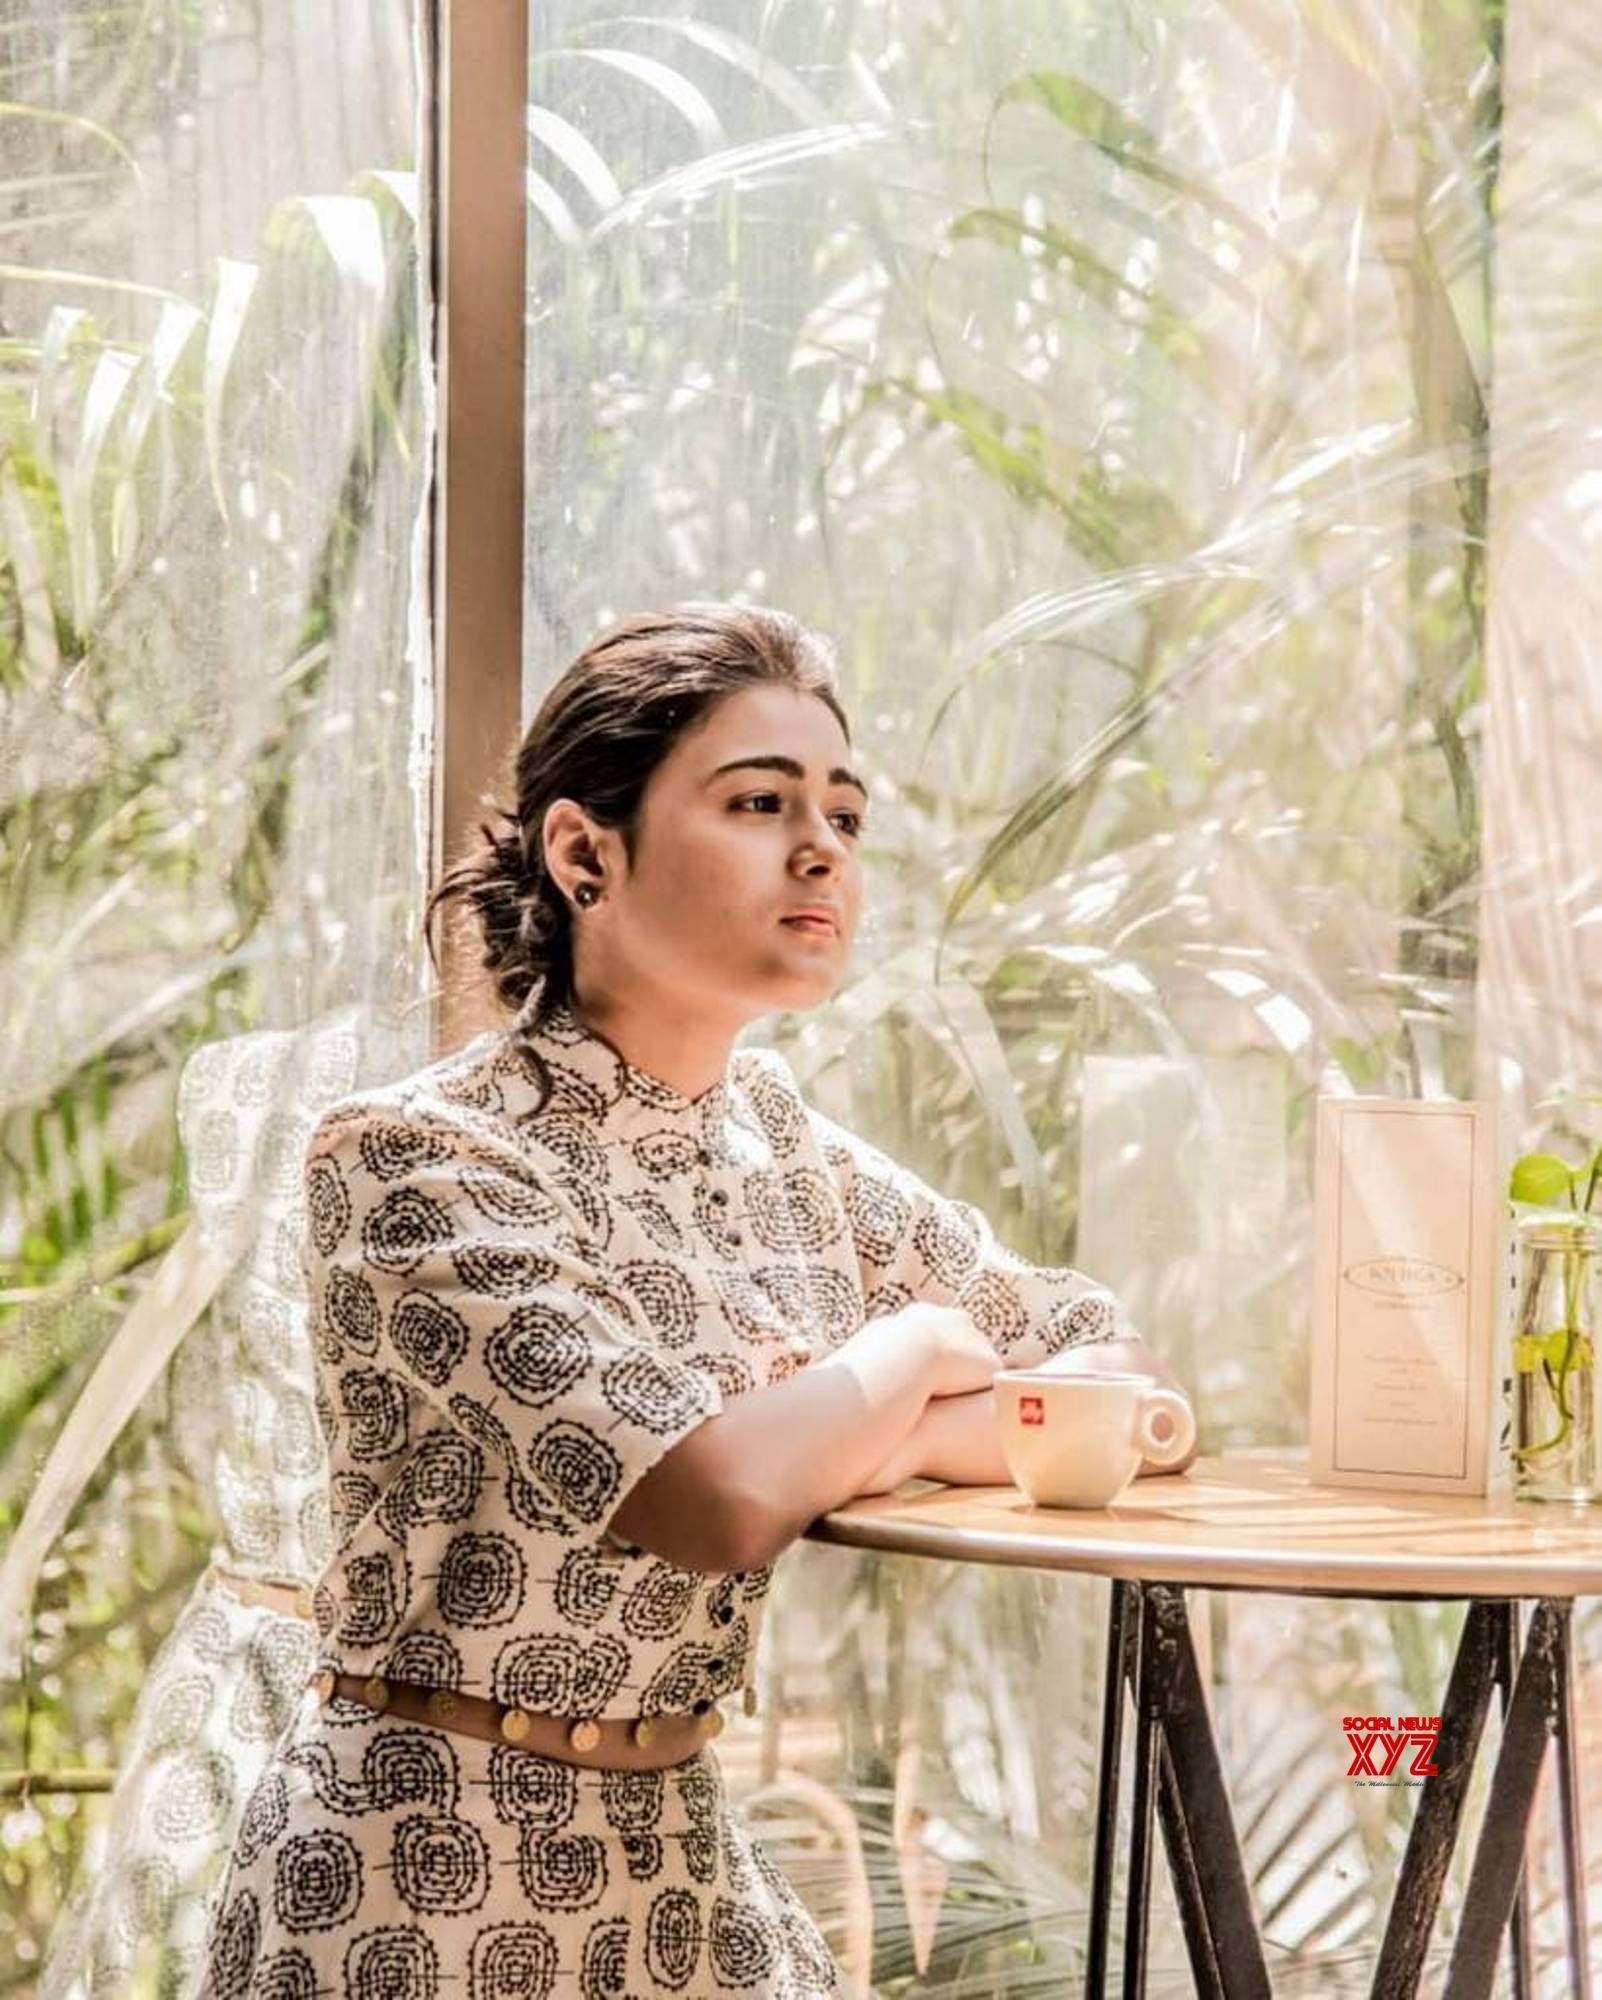 Madhu Shalini Hot Sex Great actress shalini pandey hot new stills - social news xyz